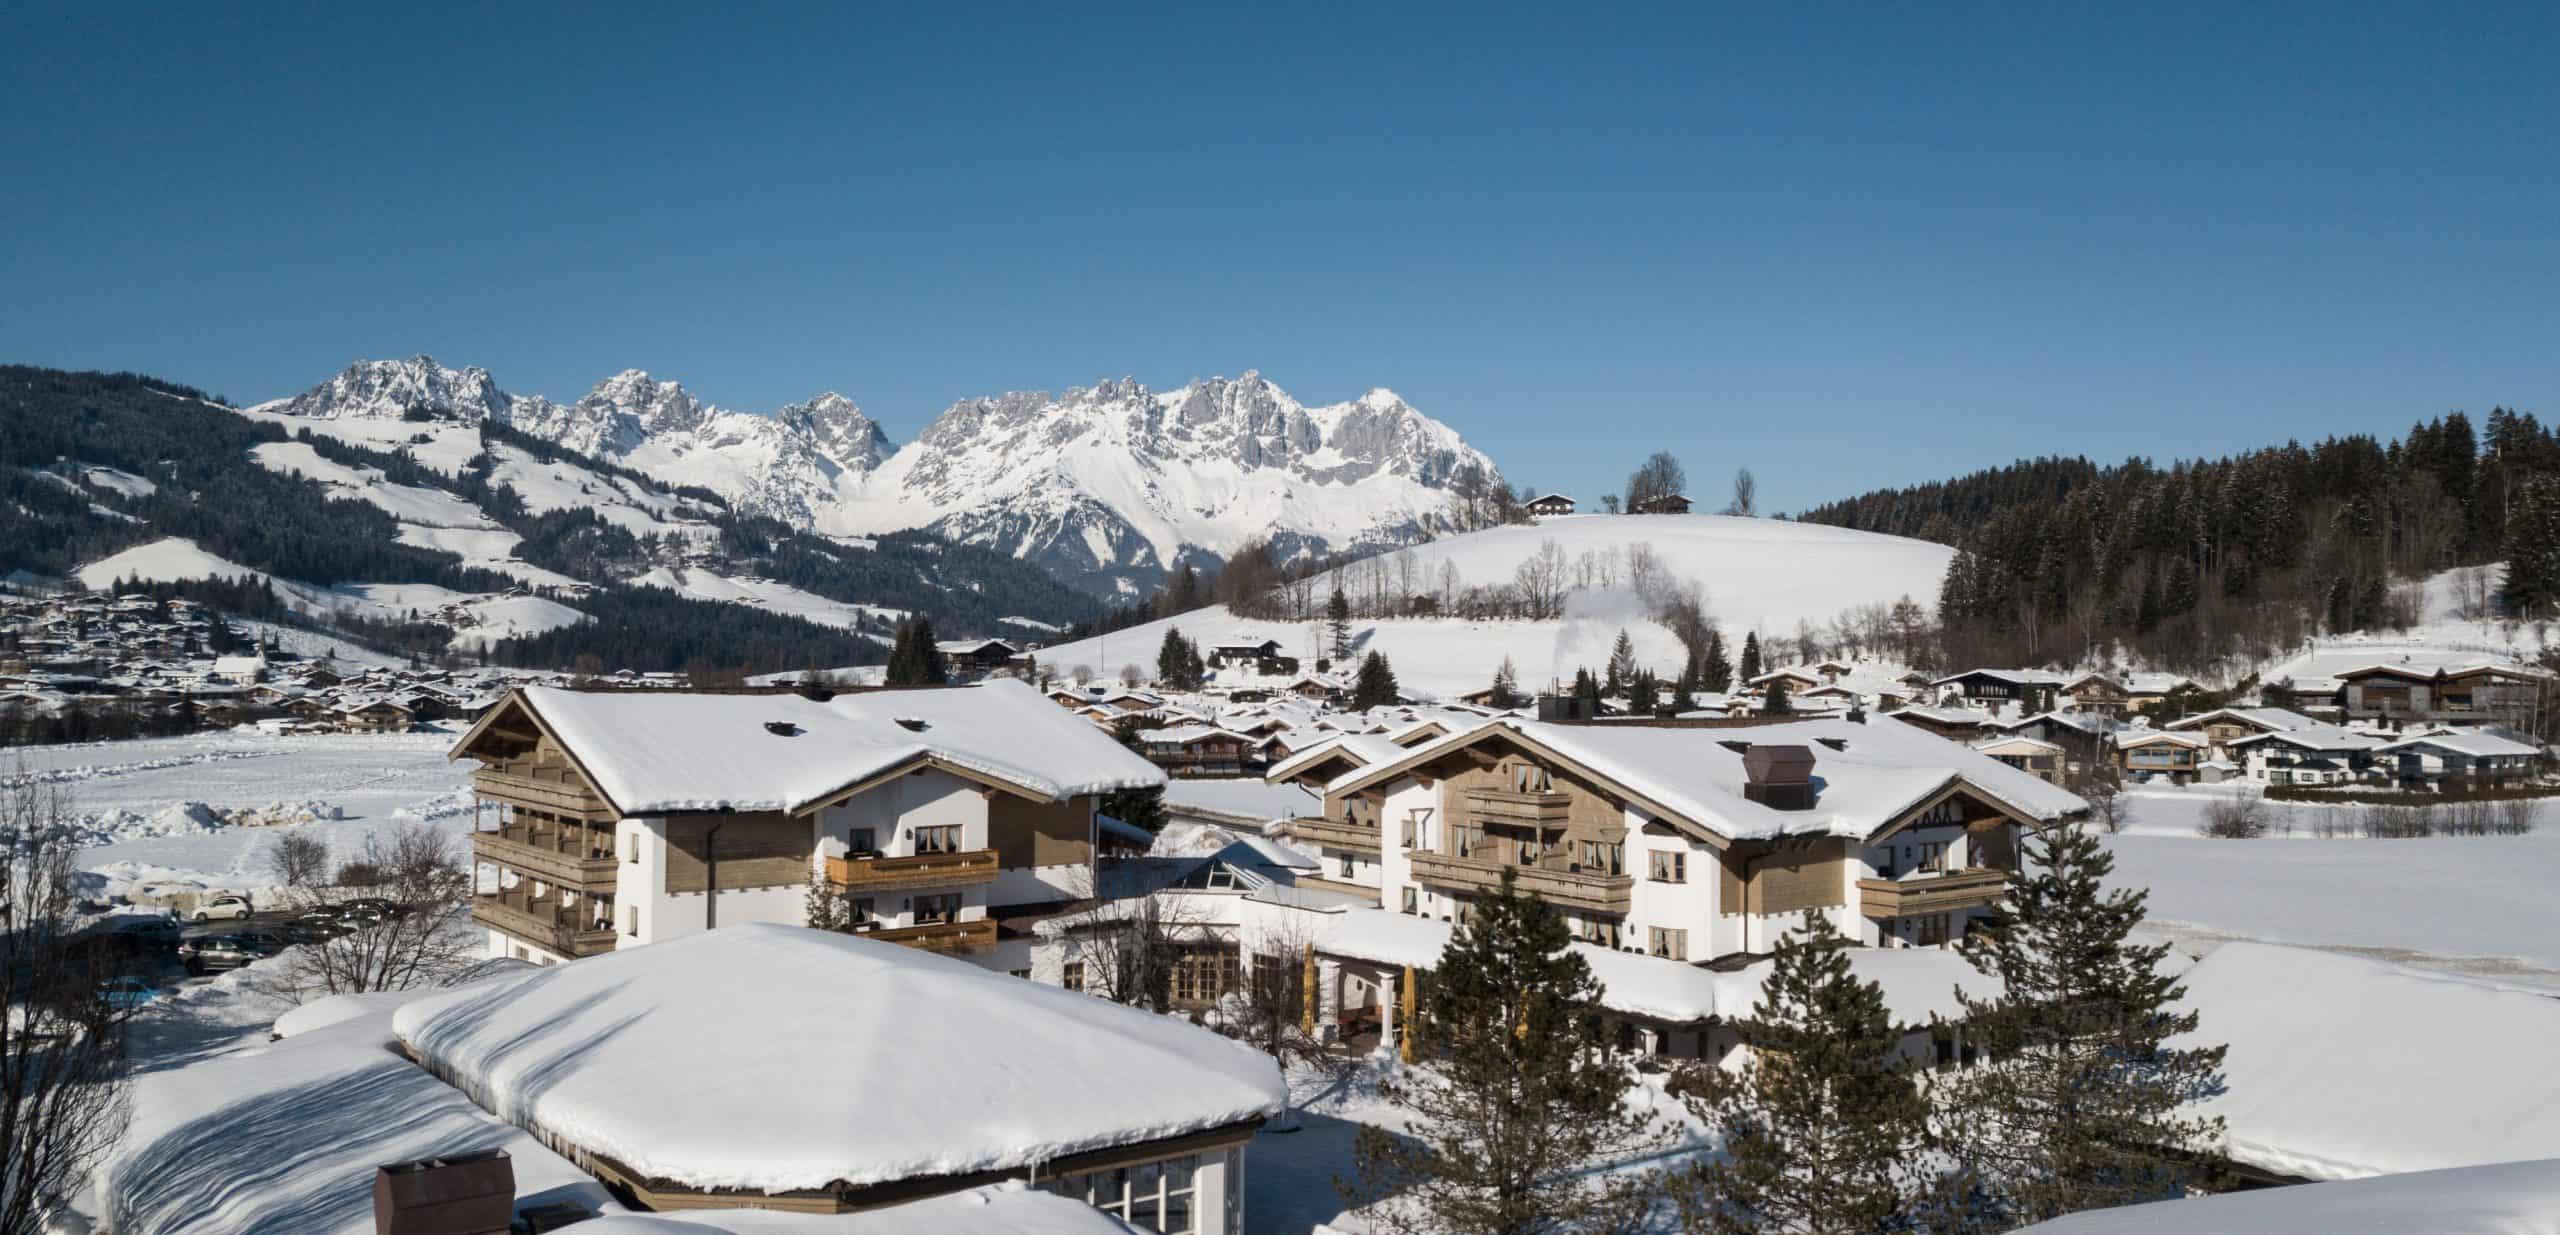 Cordial_Winter_Luftbild___11__bearbeitet-scaled